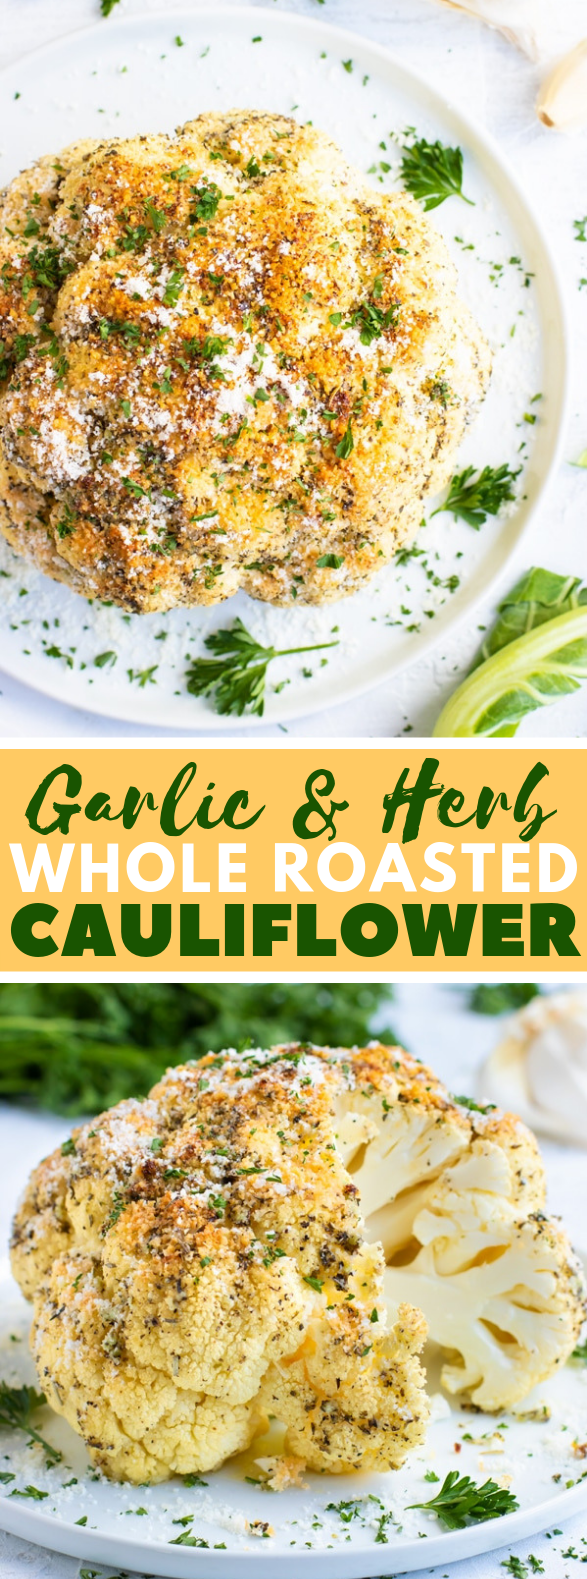 Garlic Herb Whole Roasted Cauliflower Vegetarian Vegan Whole Roasted Cauliflower Vegan Cauliflower Recipes Roasted Cauliflower Recipes